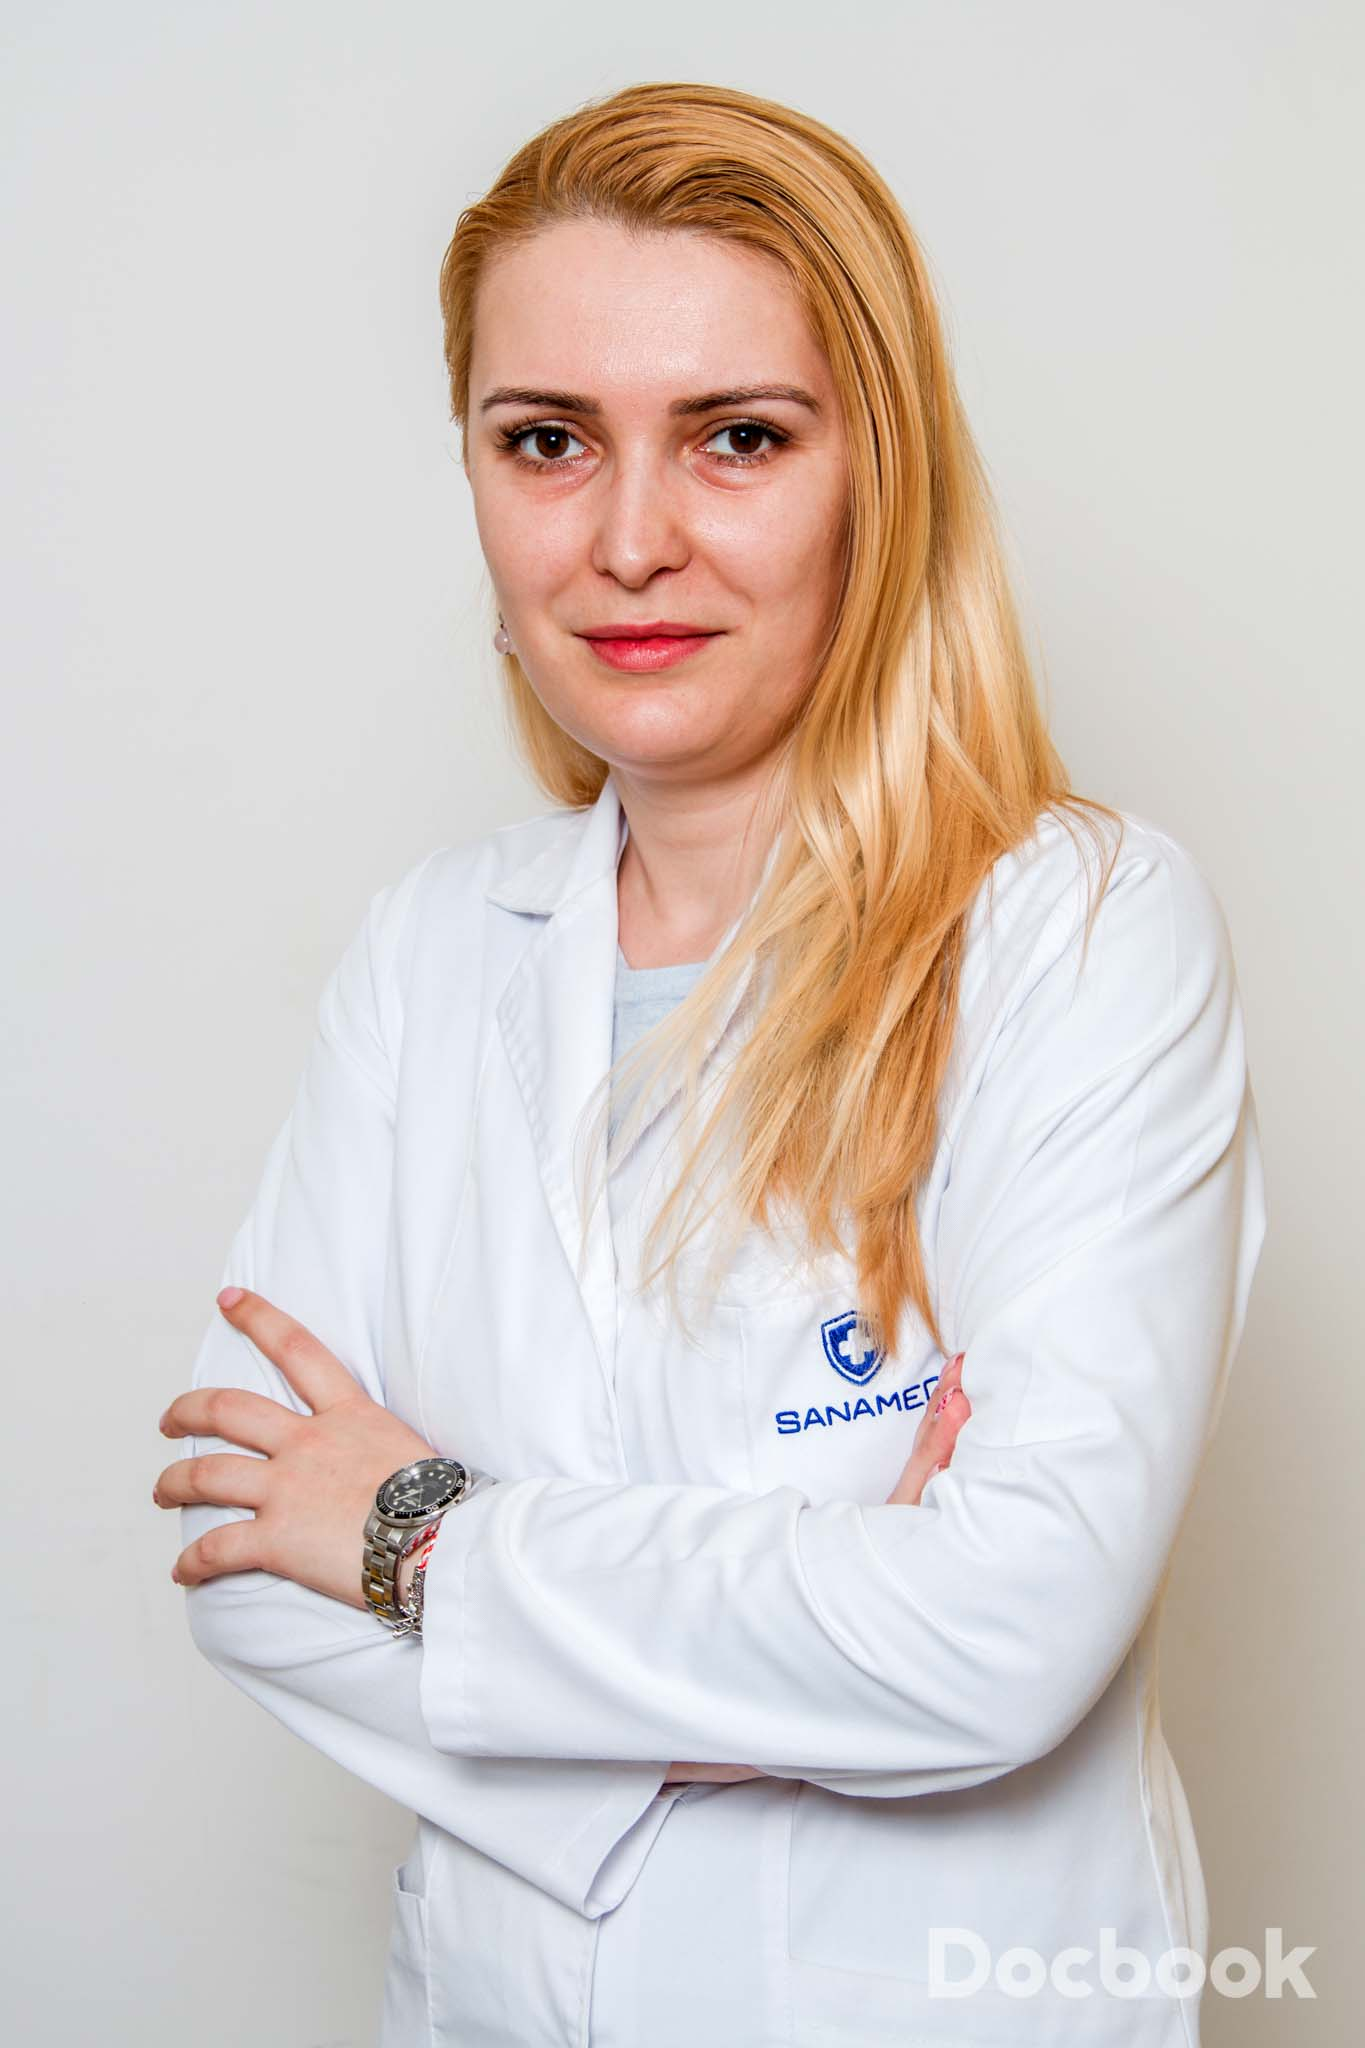 Dr. Oana-Andreea Parliteanu